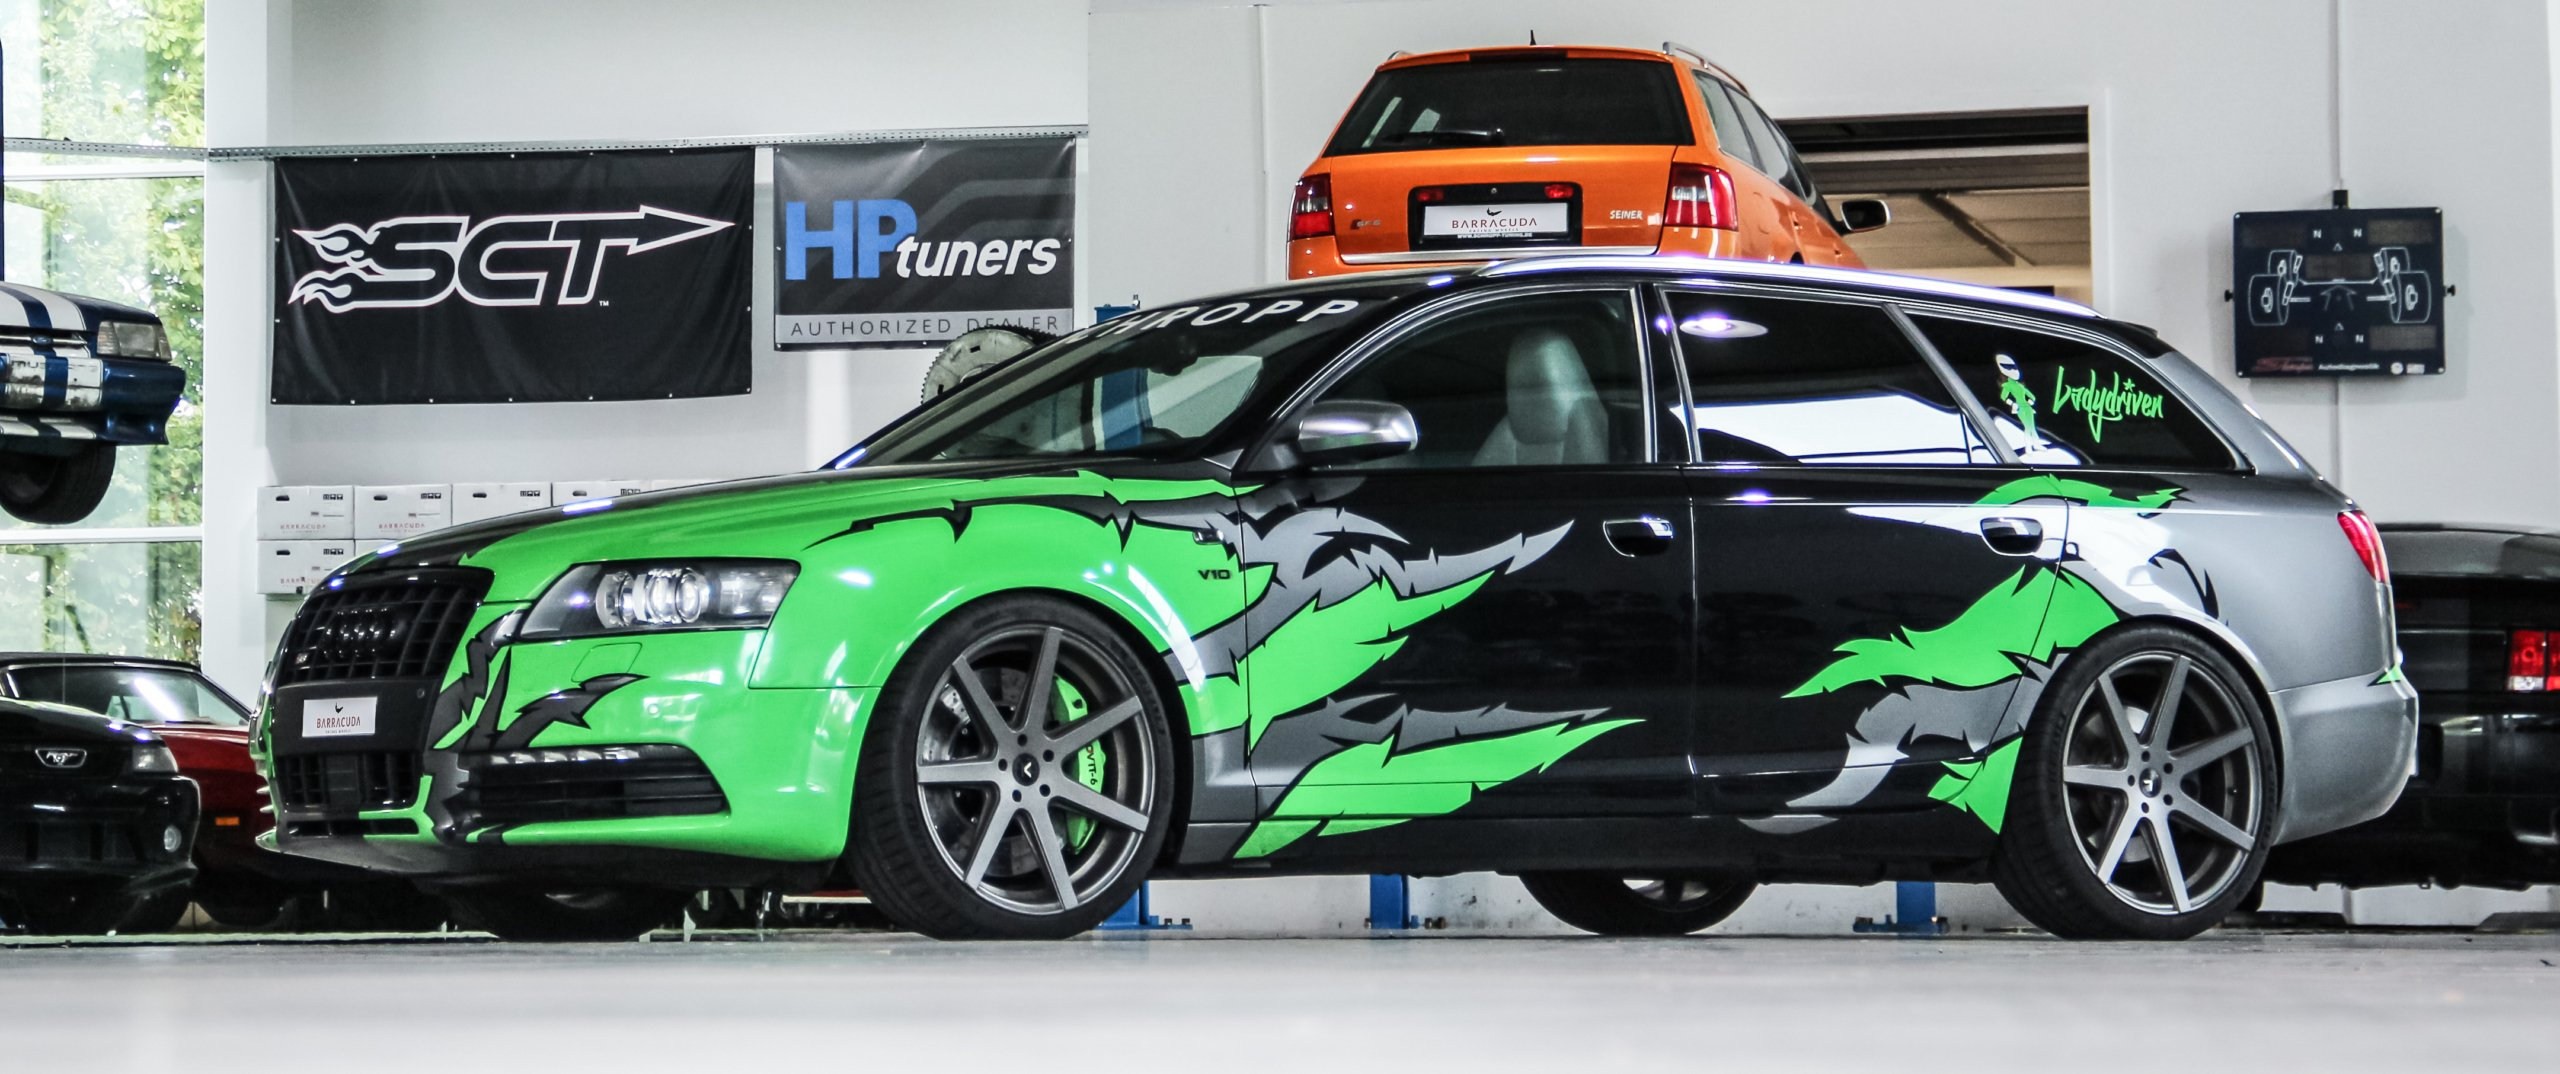 Audi – S6 – Speziallack – BARRACUDA – Virus – Gunmetall – 20 Zoll